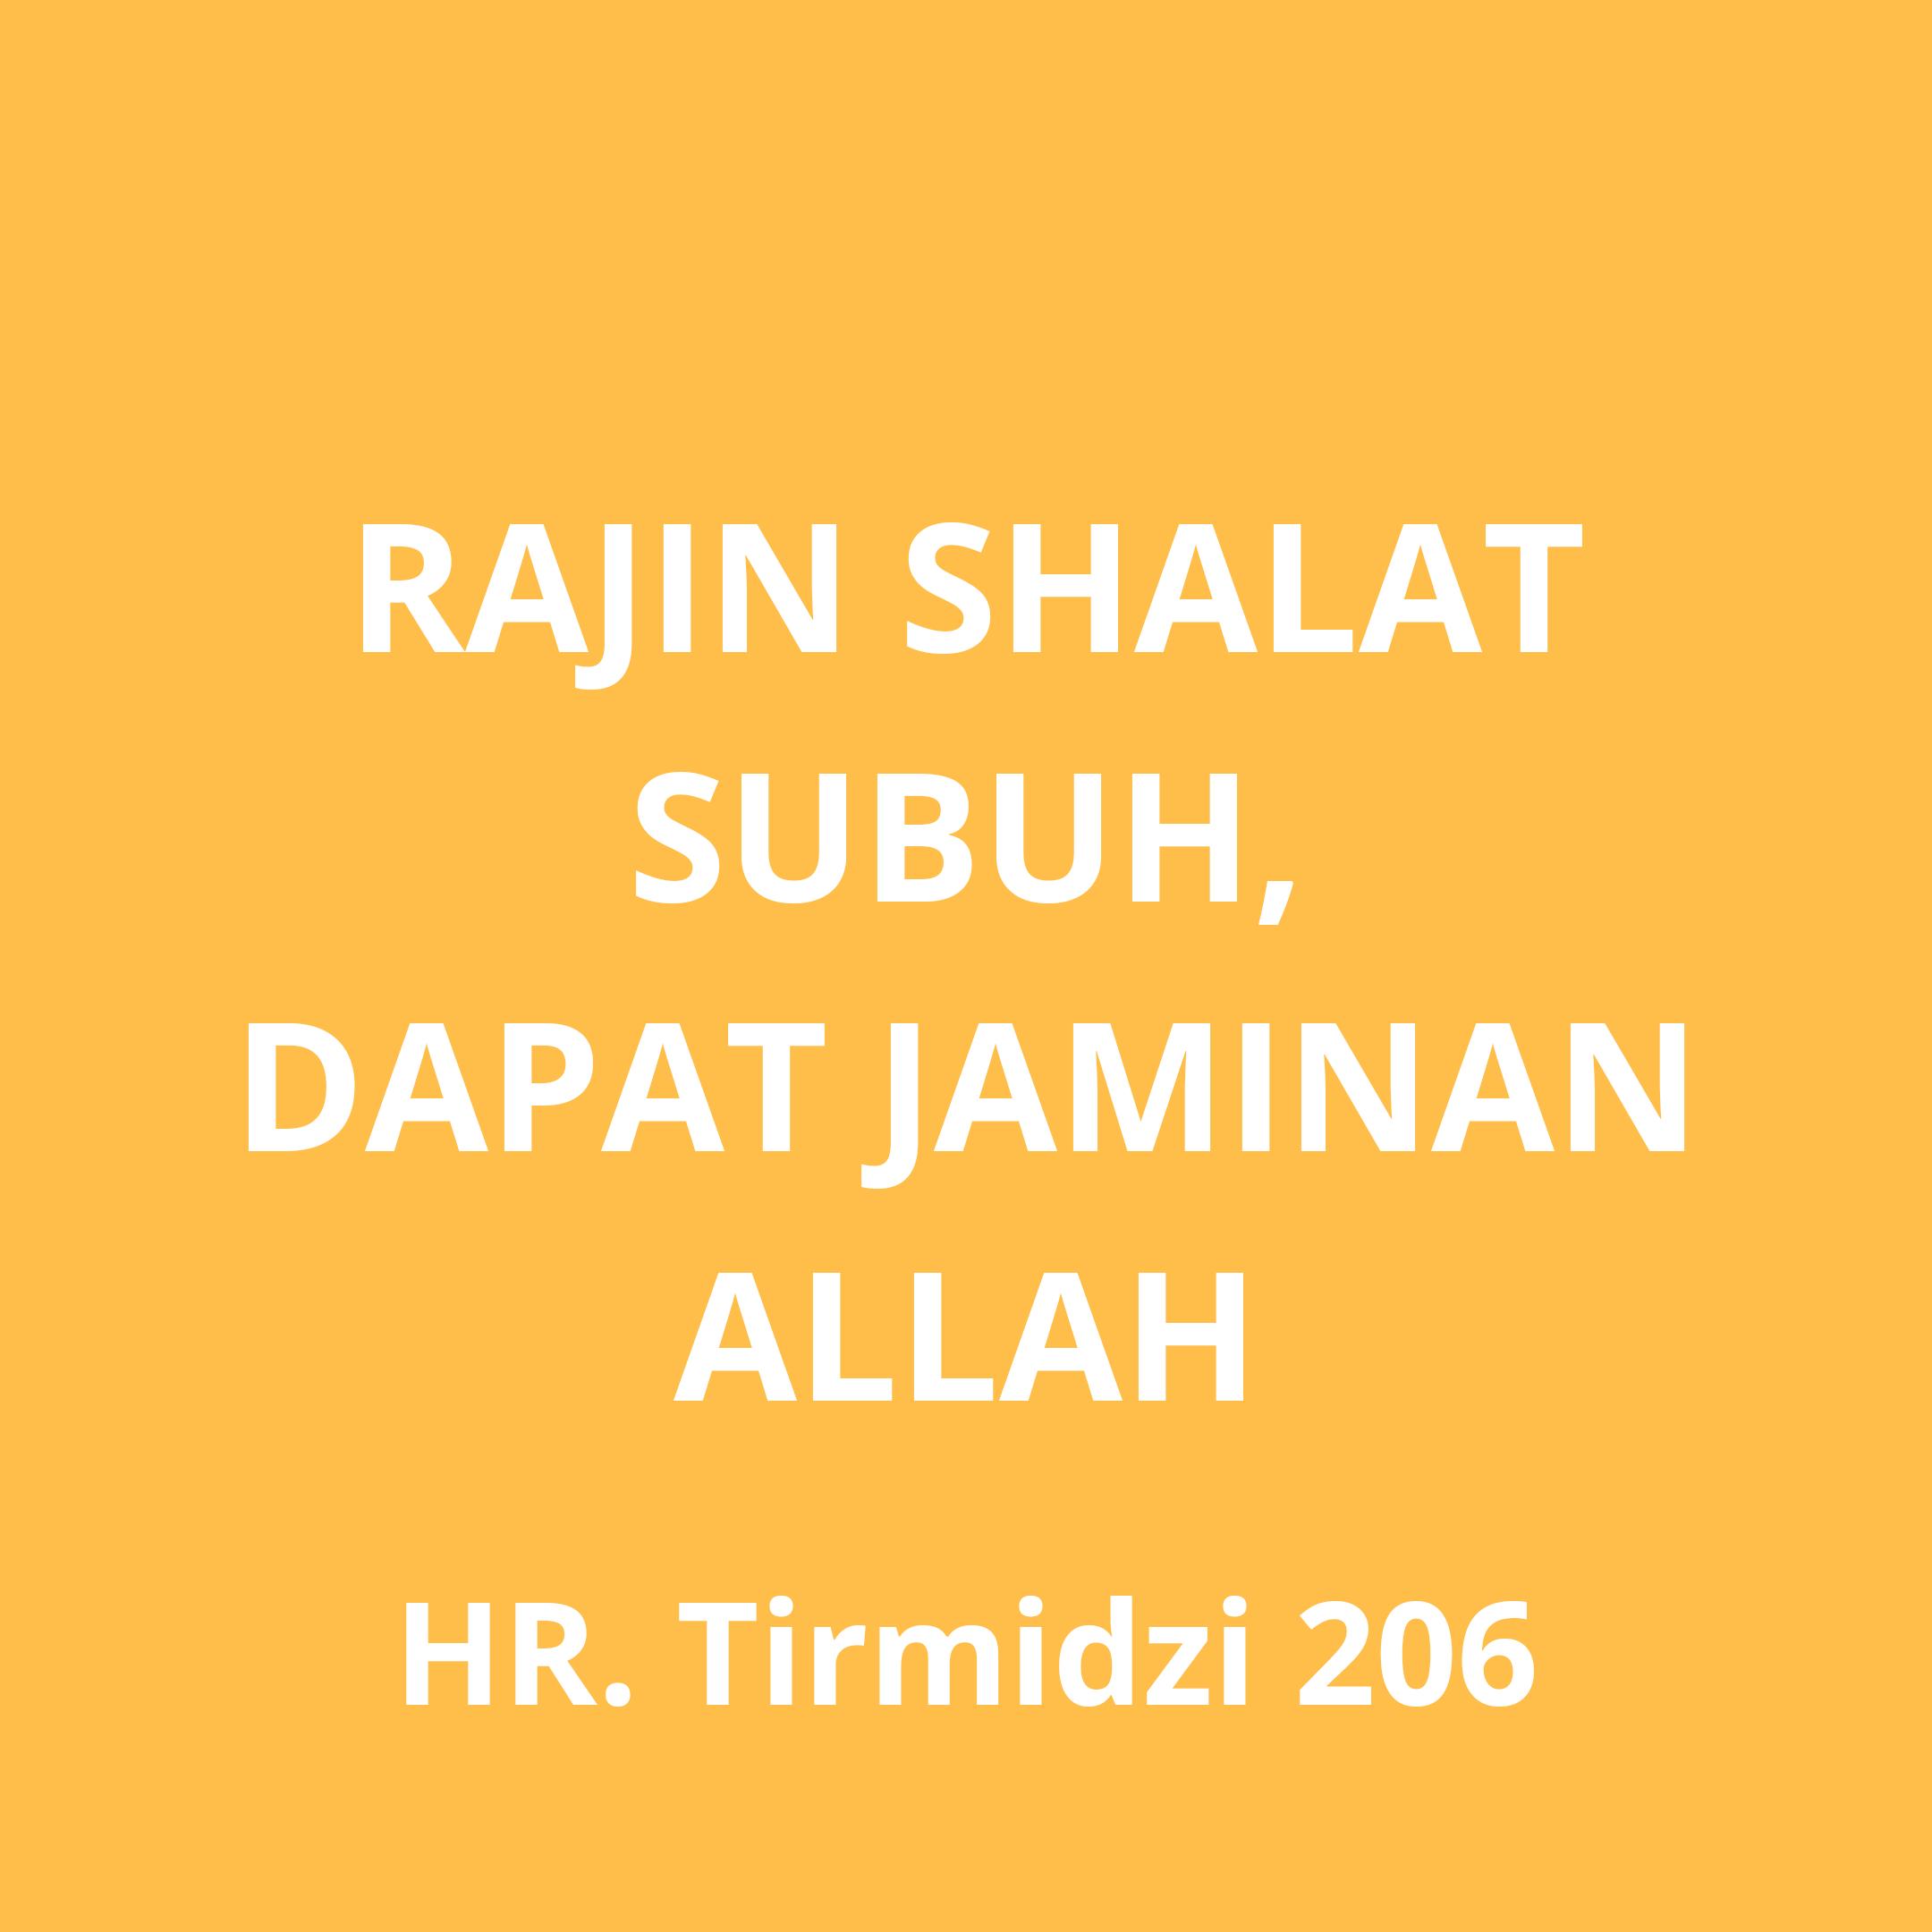 Rajin Shalat Subuh Dapat Jaminan Allah